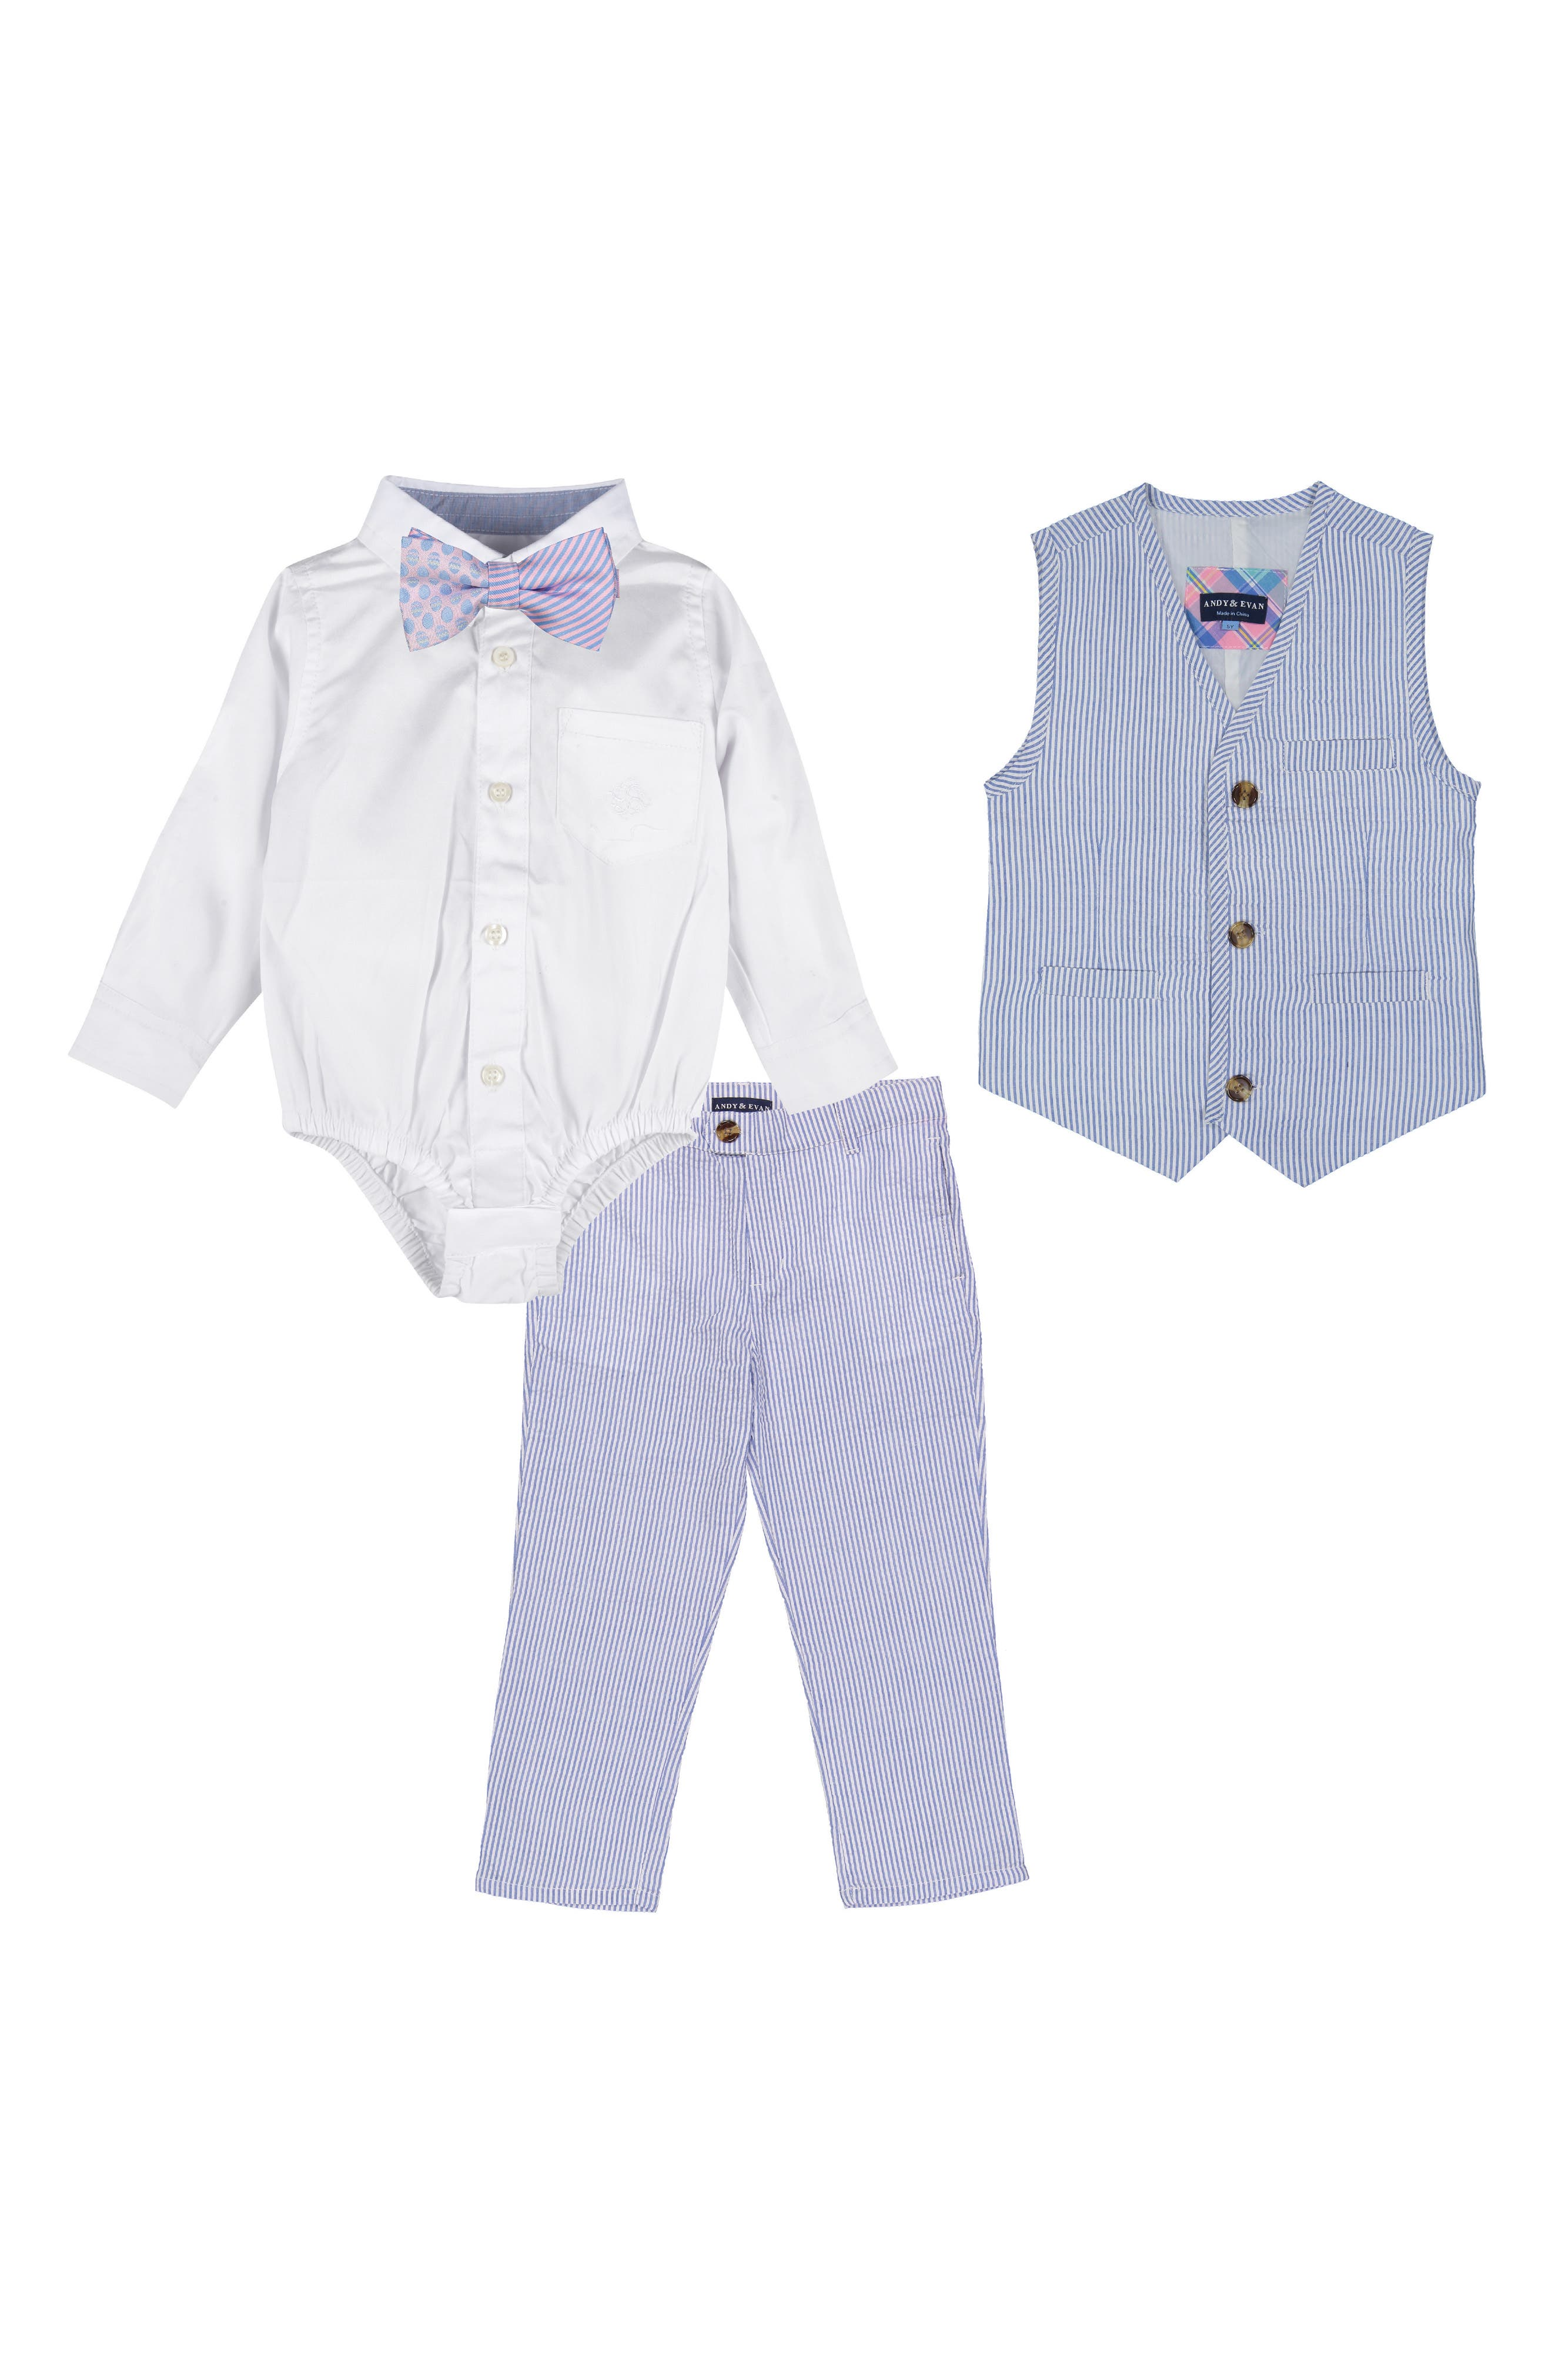 Andy & Evan Romper, Vest & Pants Set (Baby Boys)